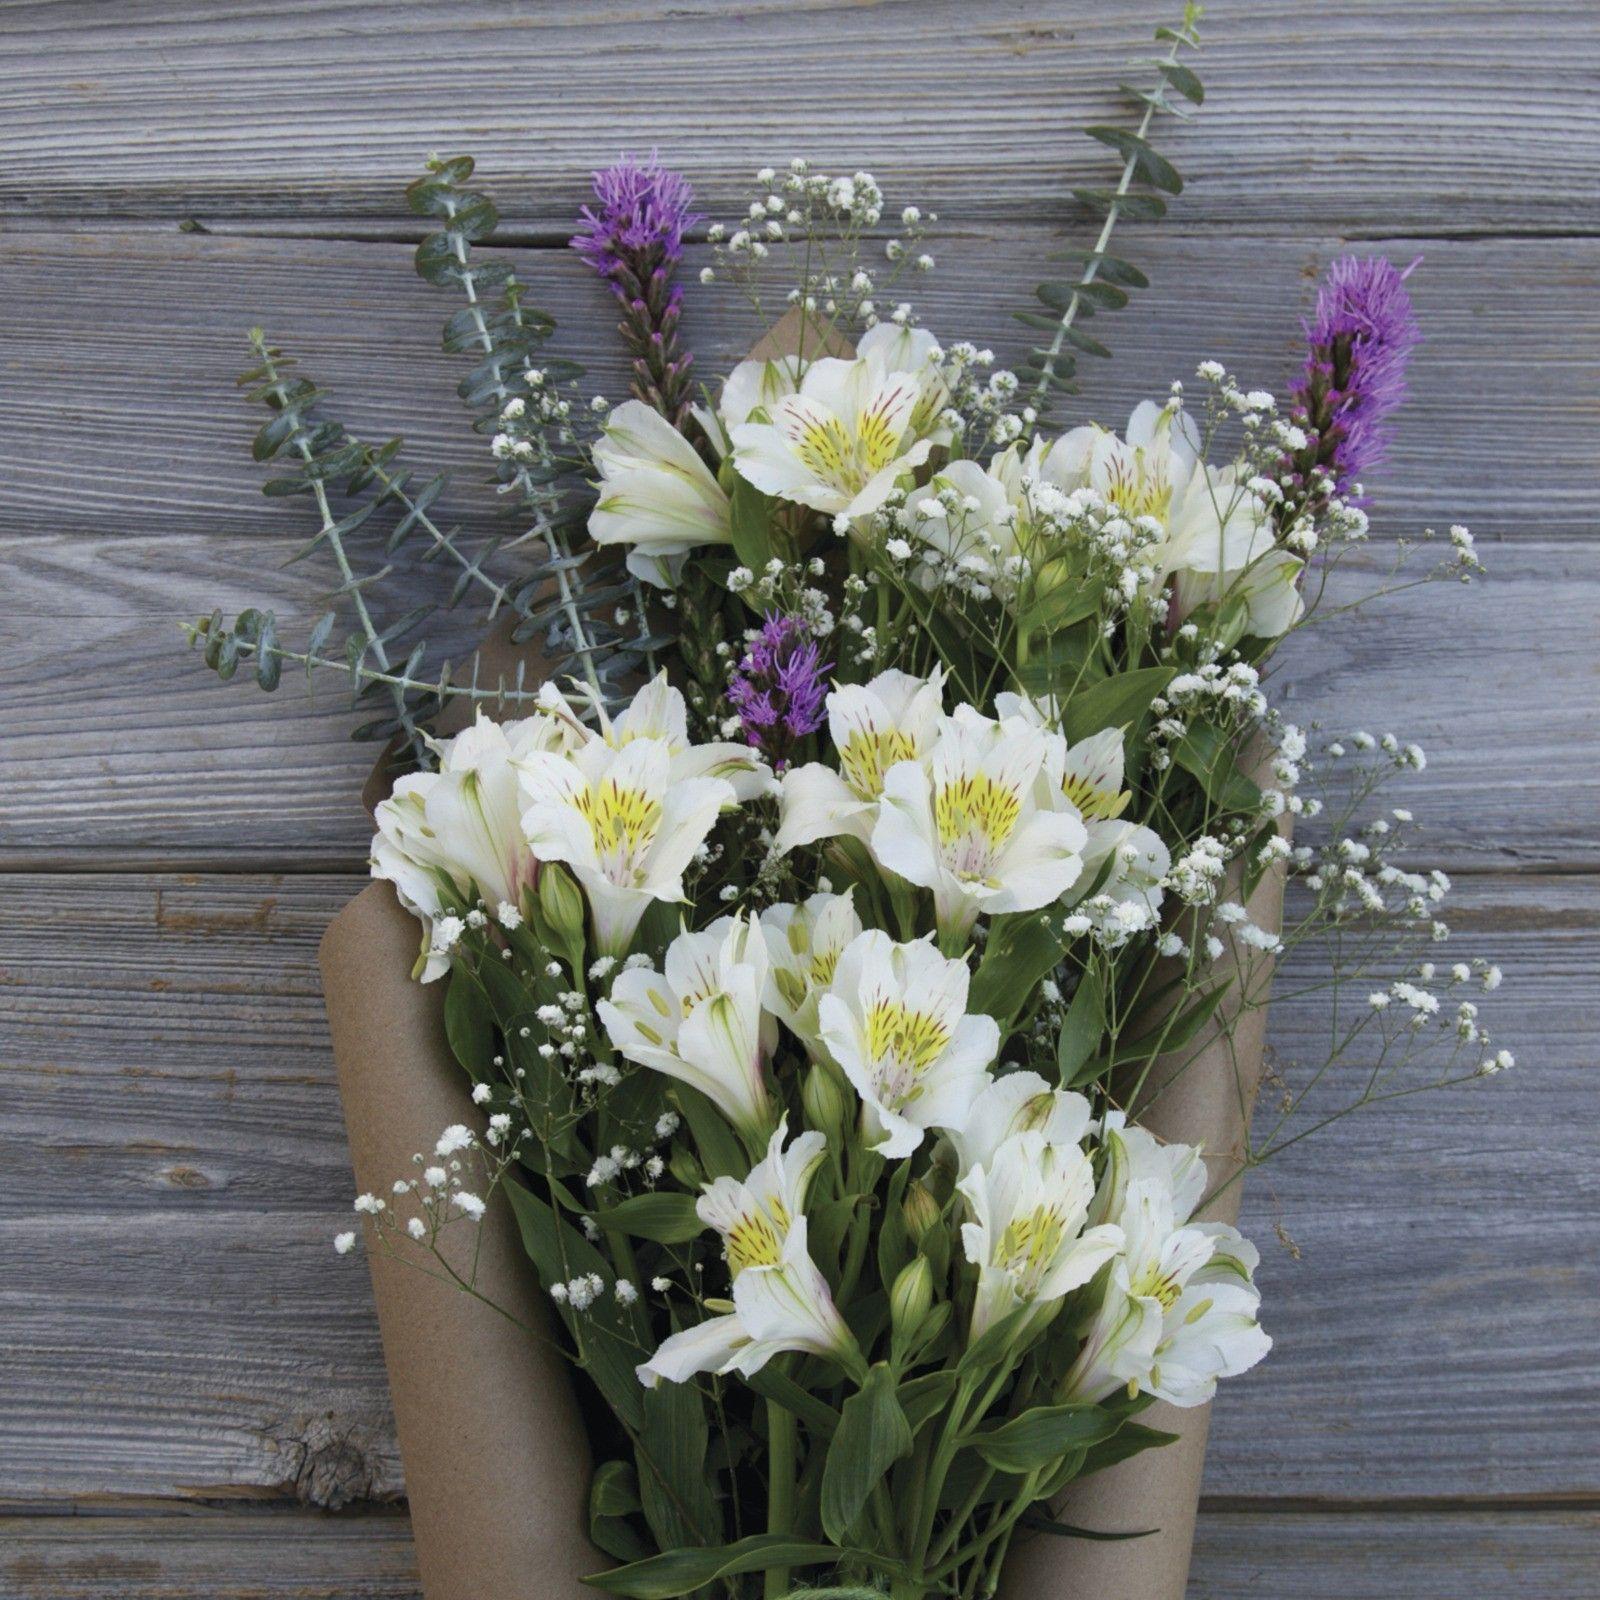 Pinterest Pop Up The Bouqs Company Flower Arrangements Flower Subscription Flower Delivery